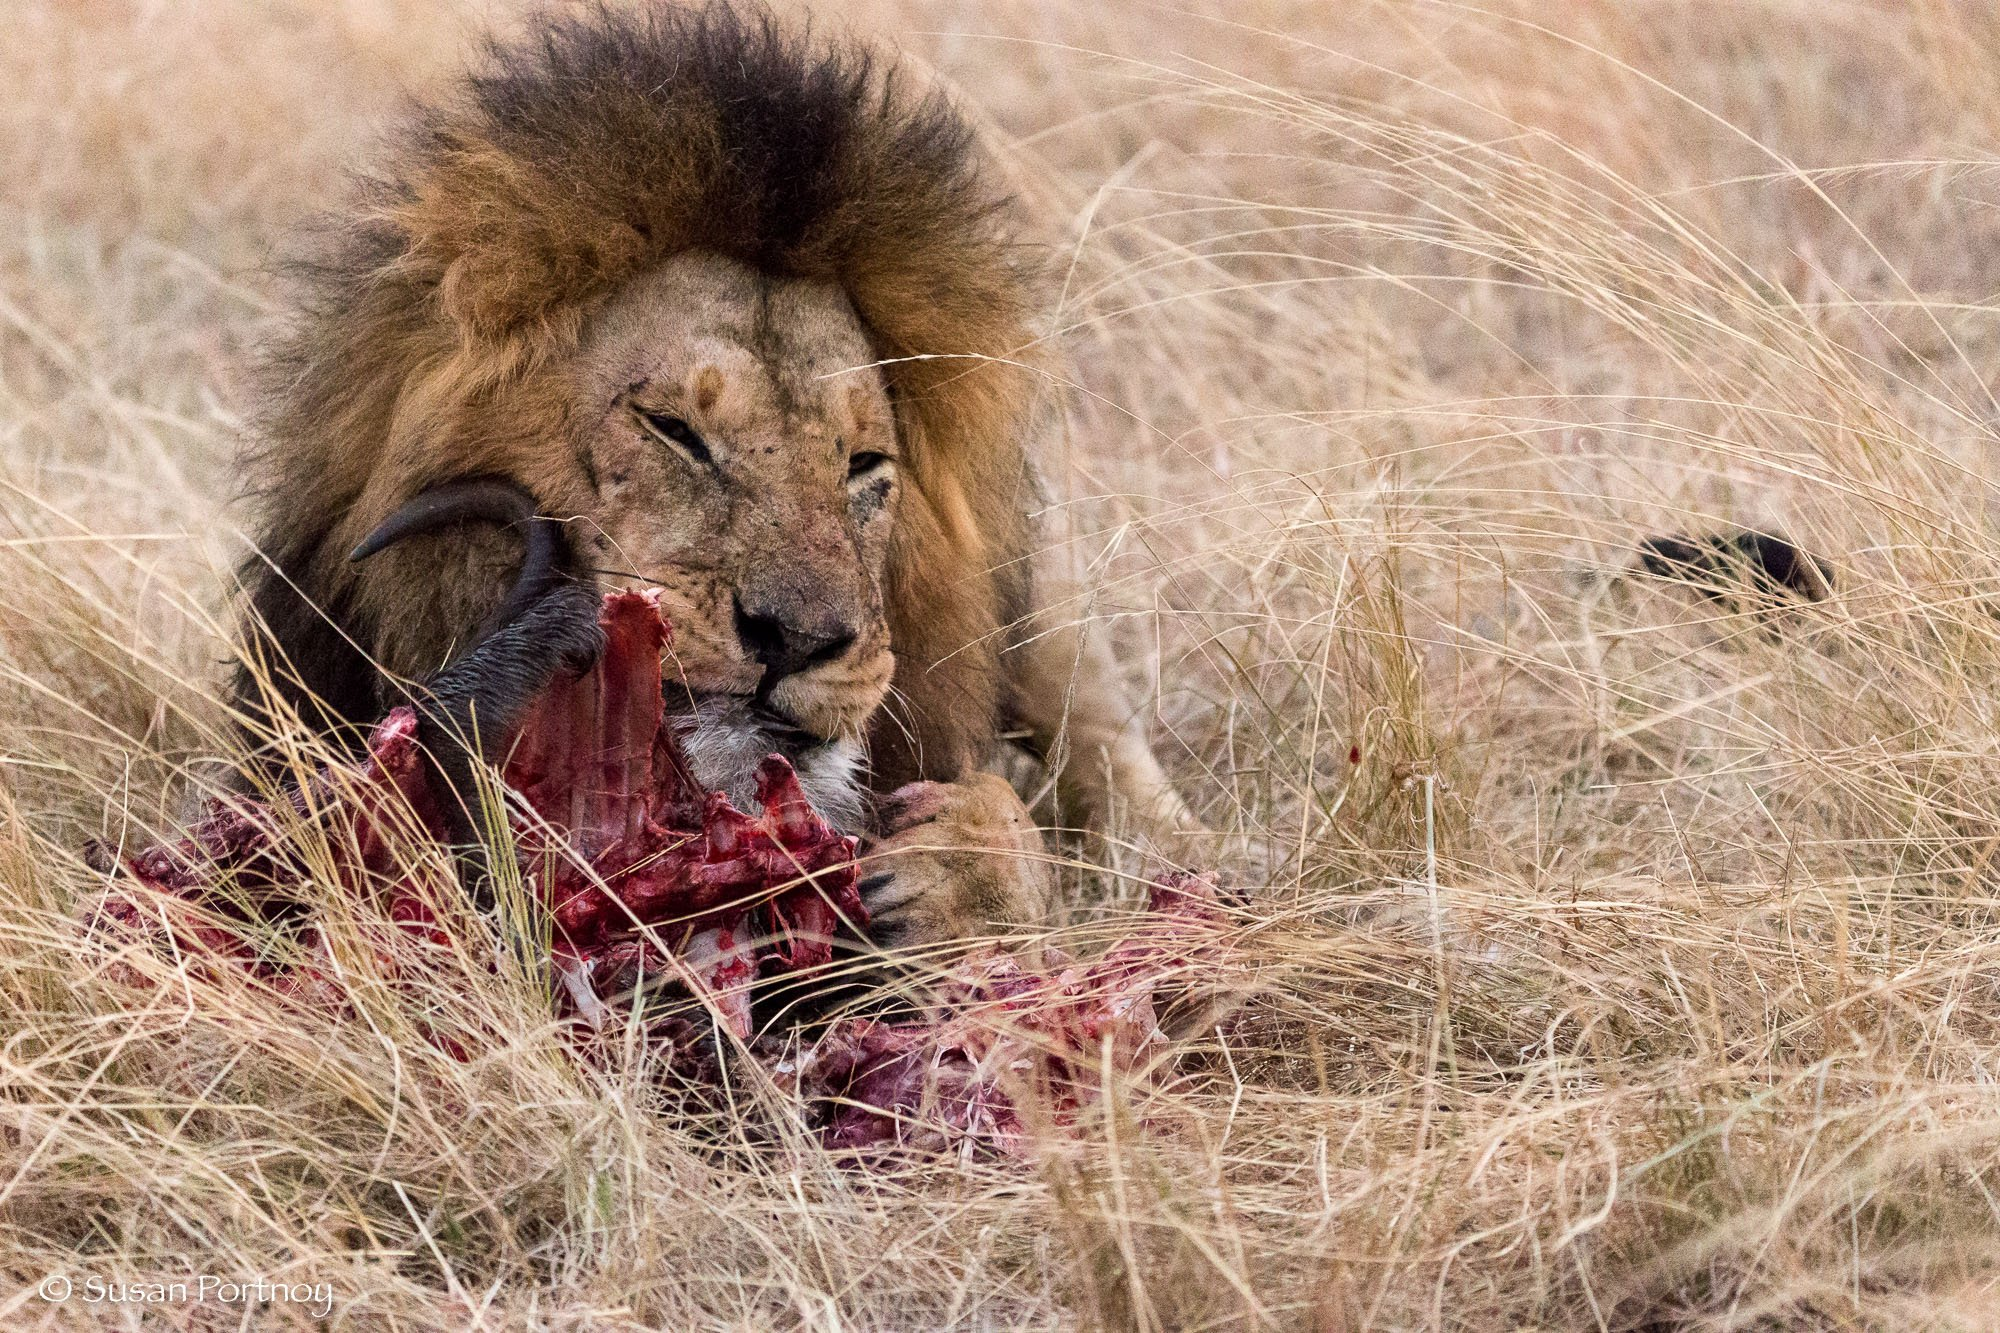 A big male lion eats a kill in the high grass of the Masai Mara